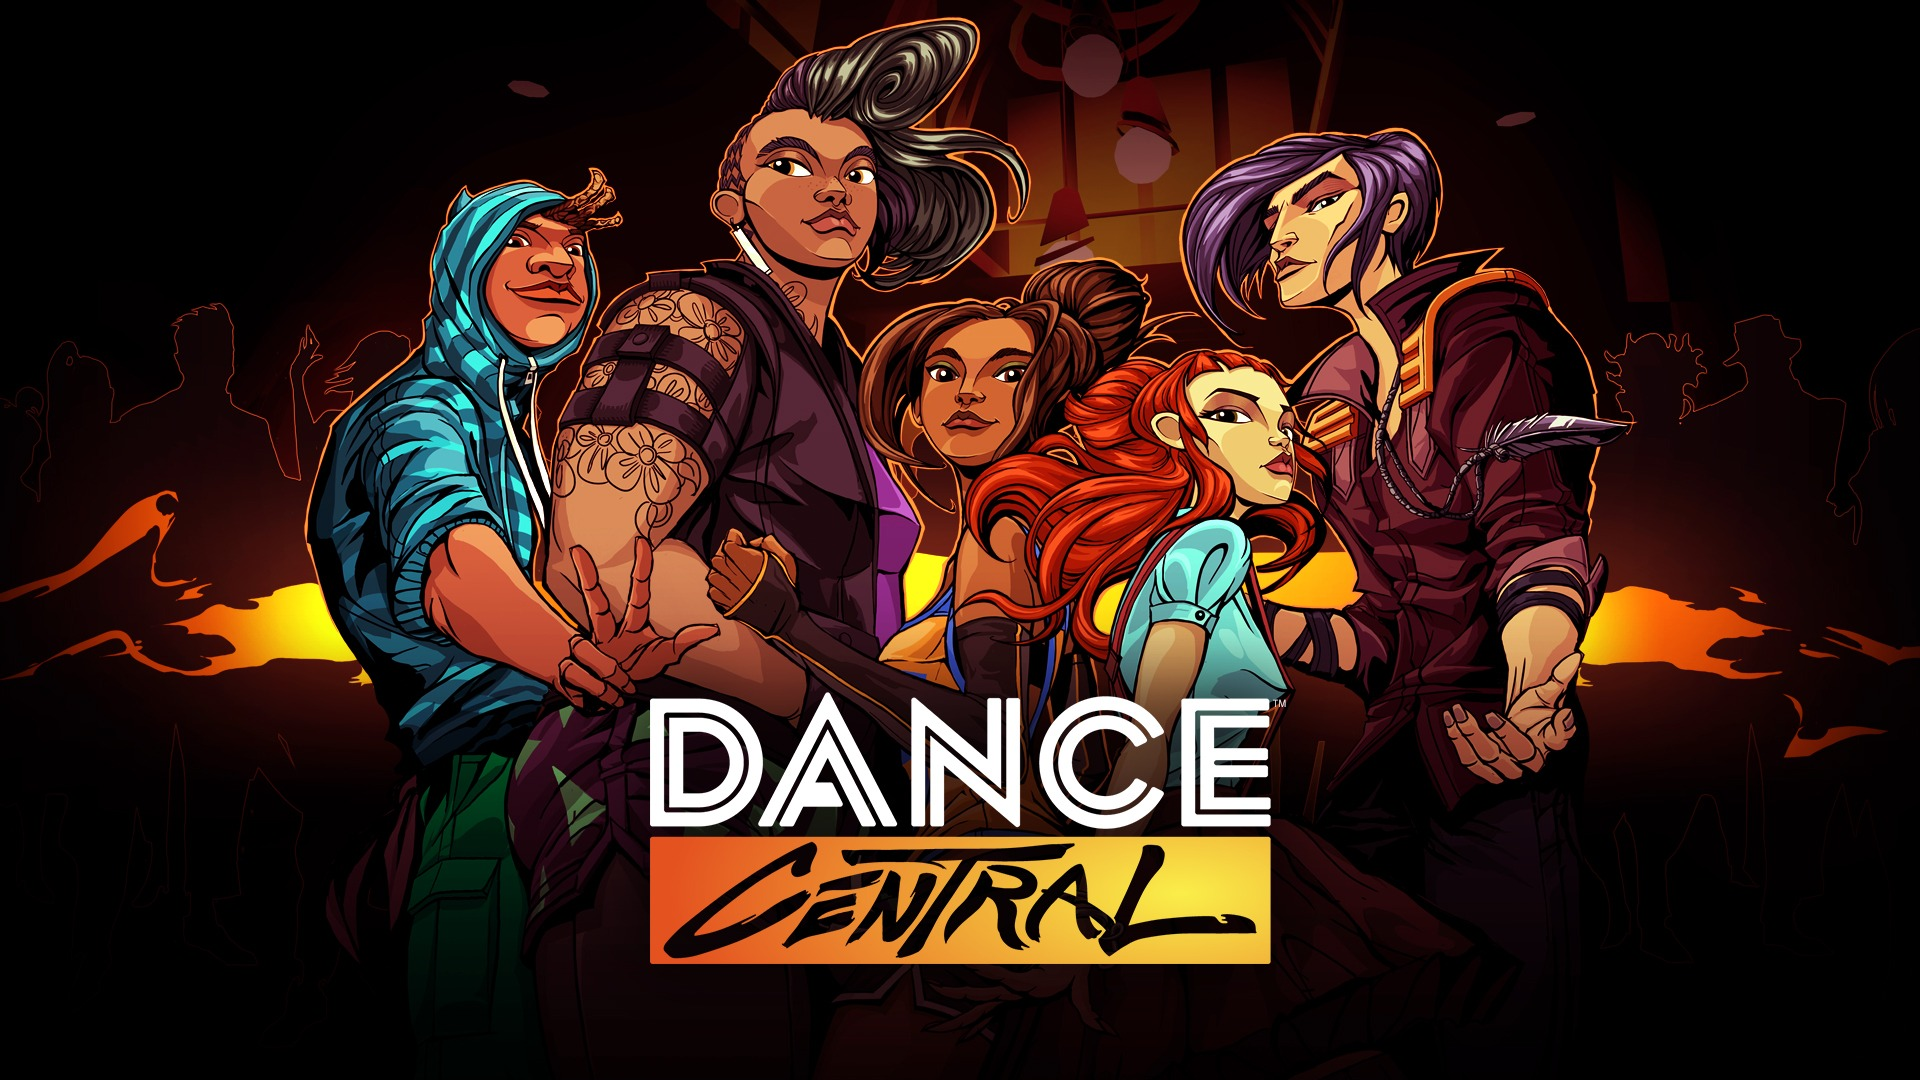 Dance Central Bemutató